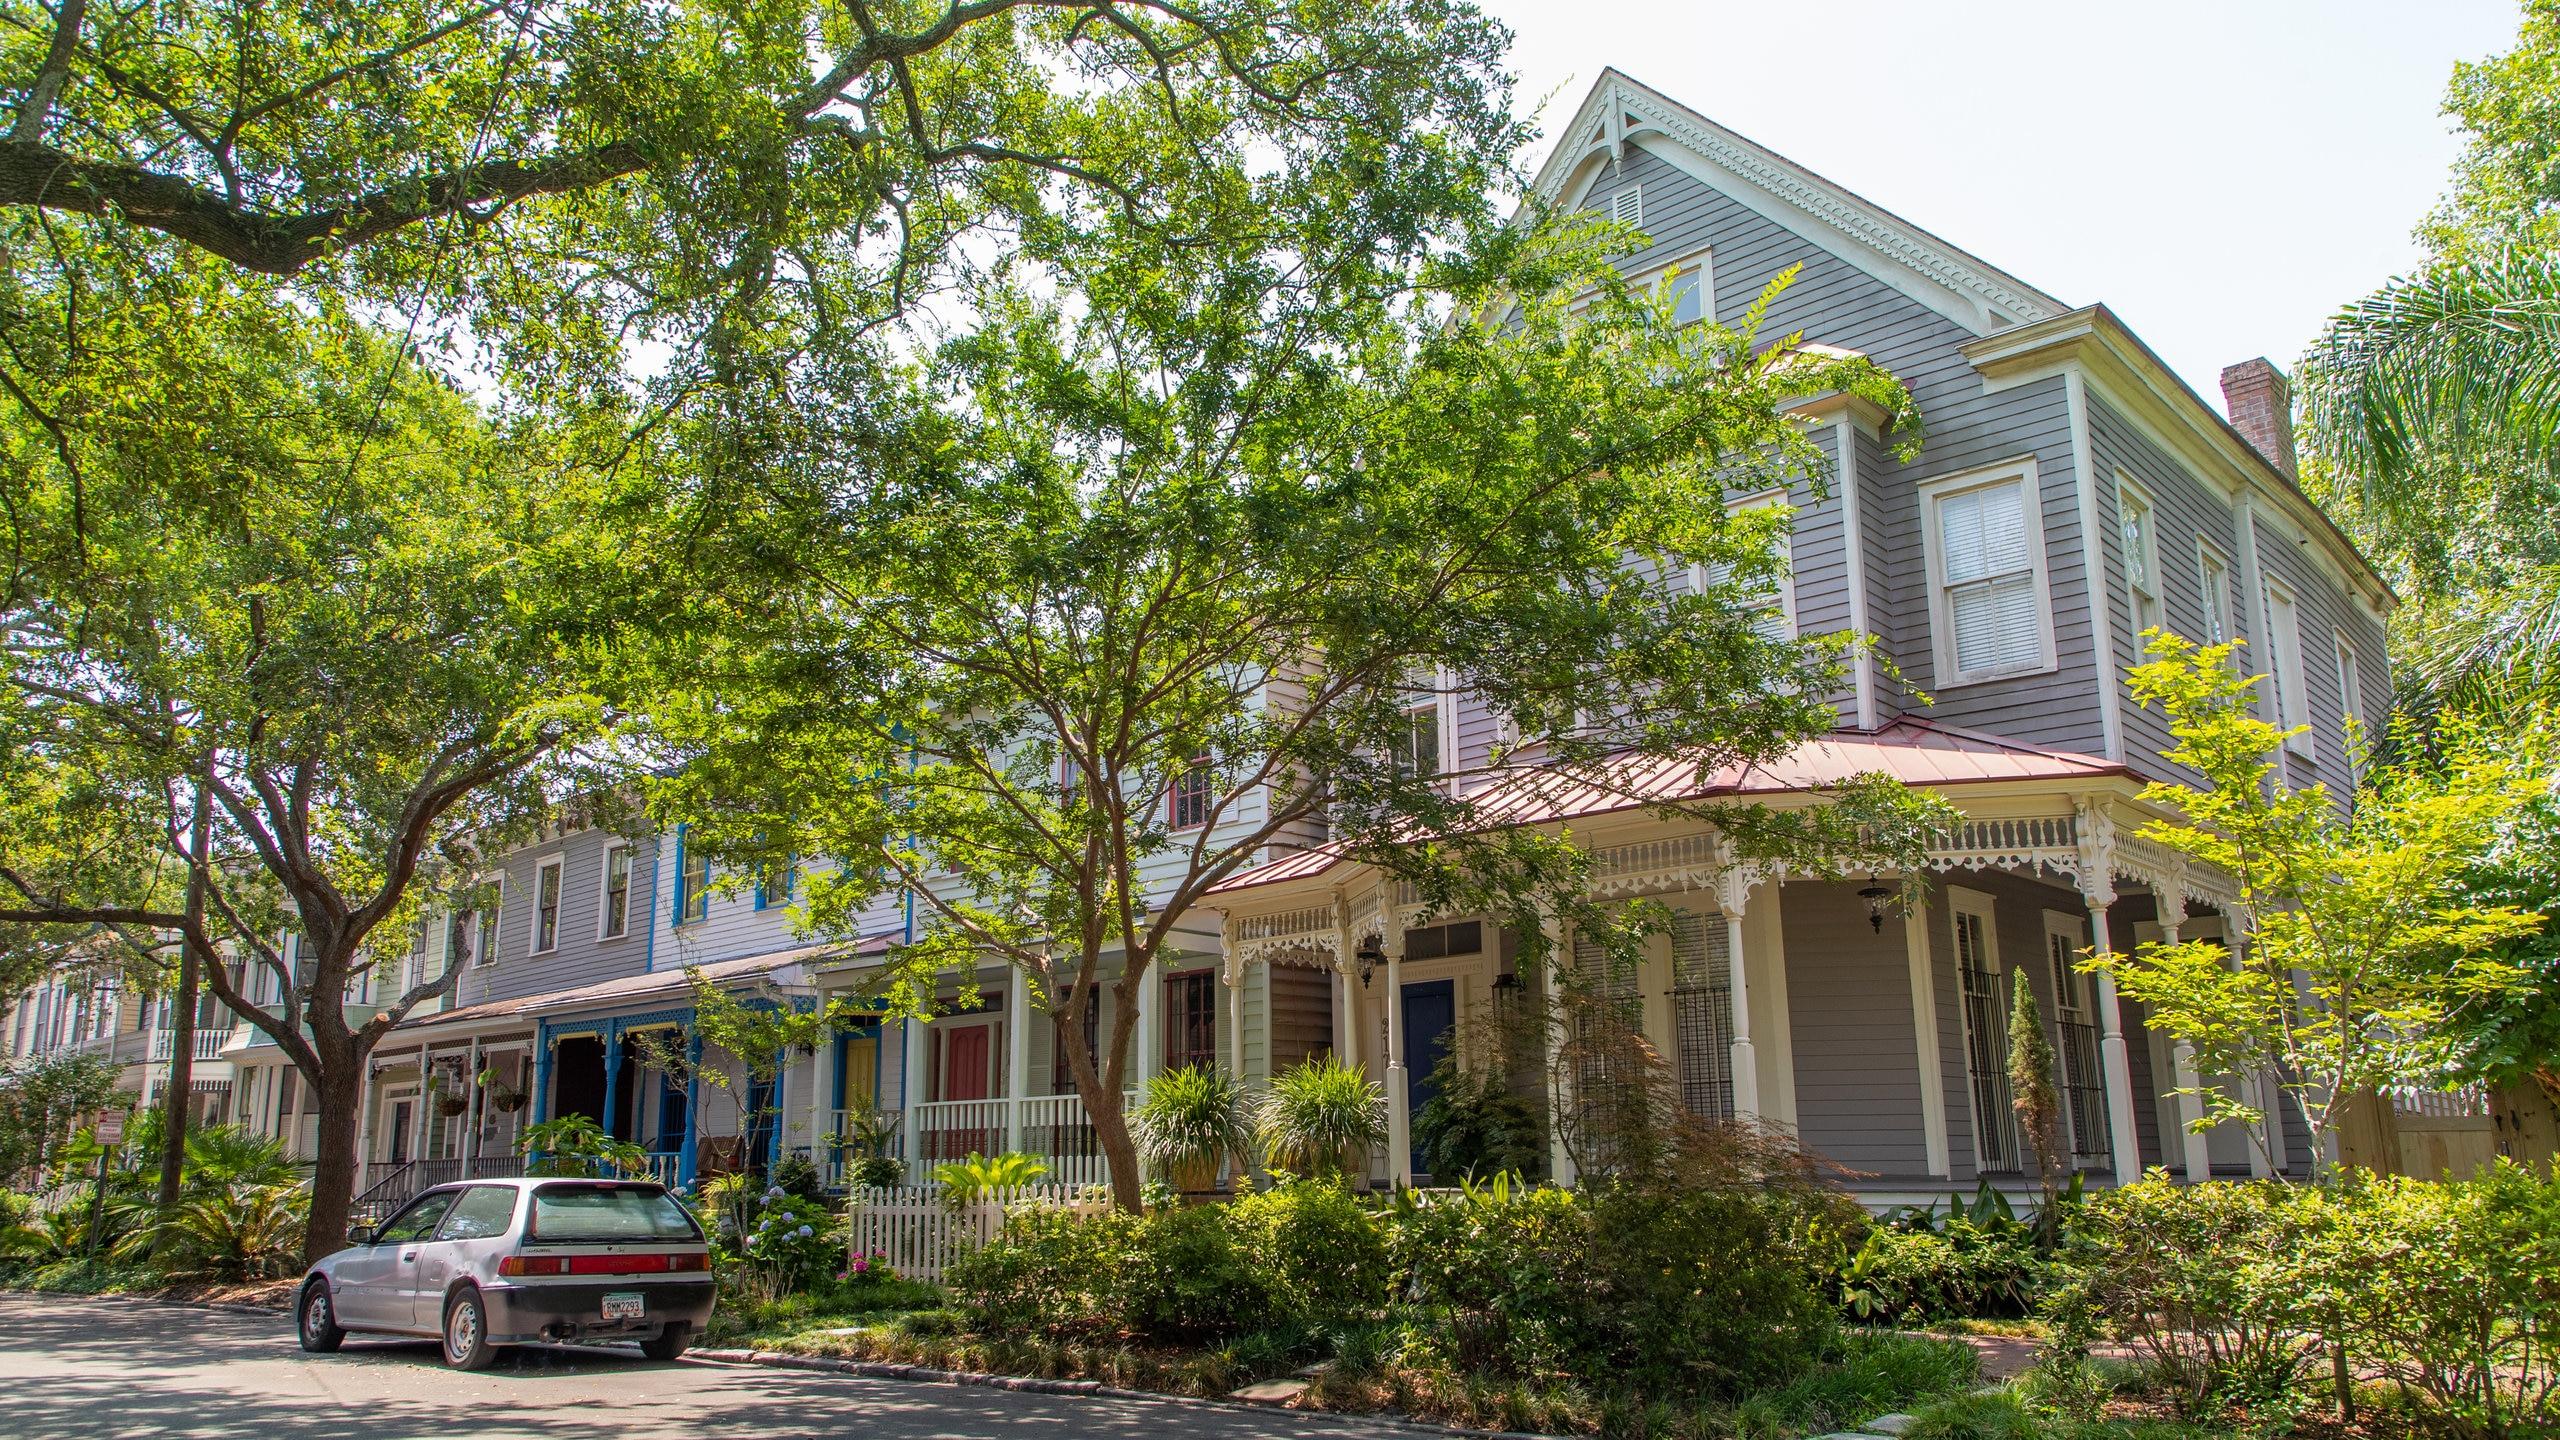 Viktorianischer Bezirk Savannah, Savannah, Georgia, USA